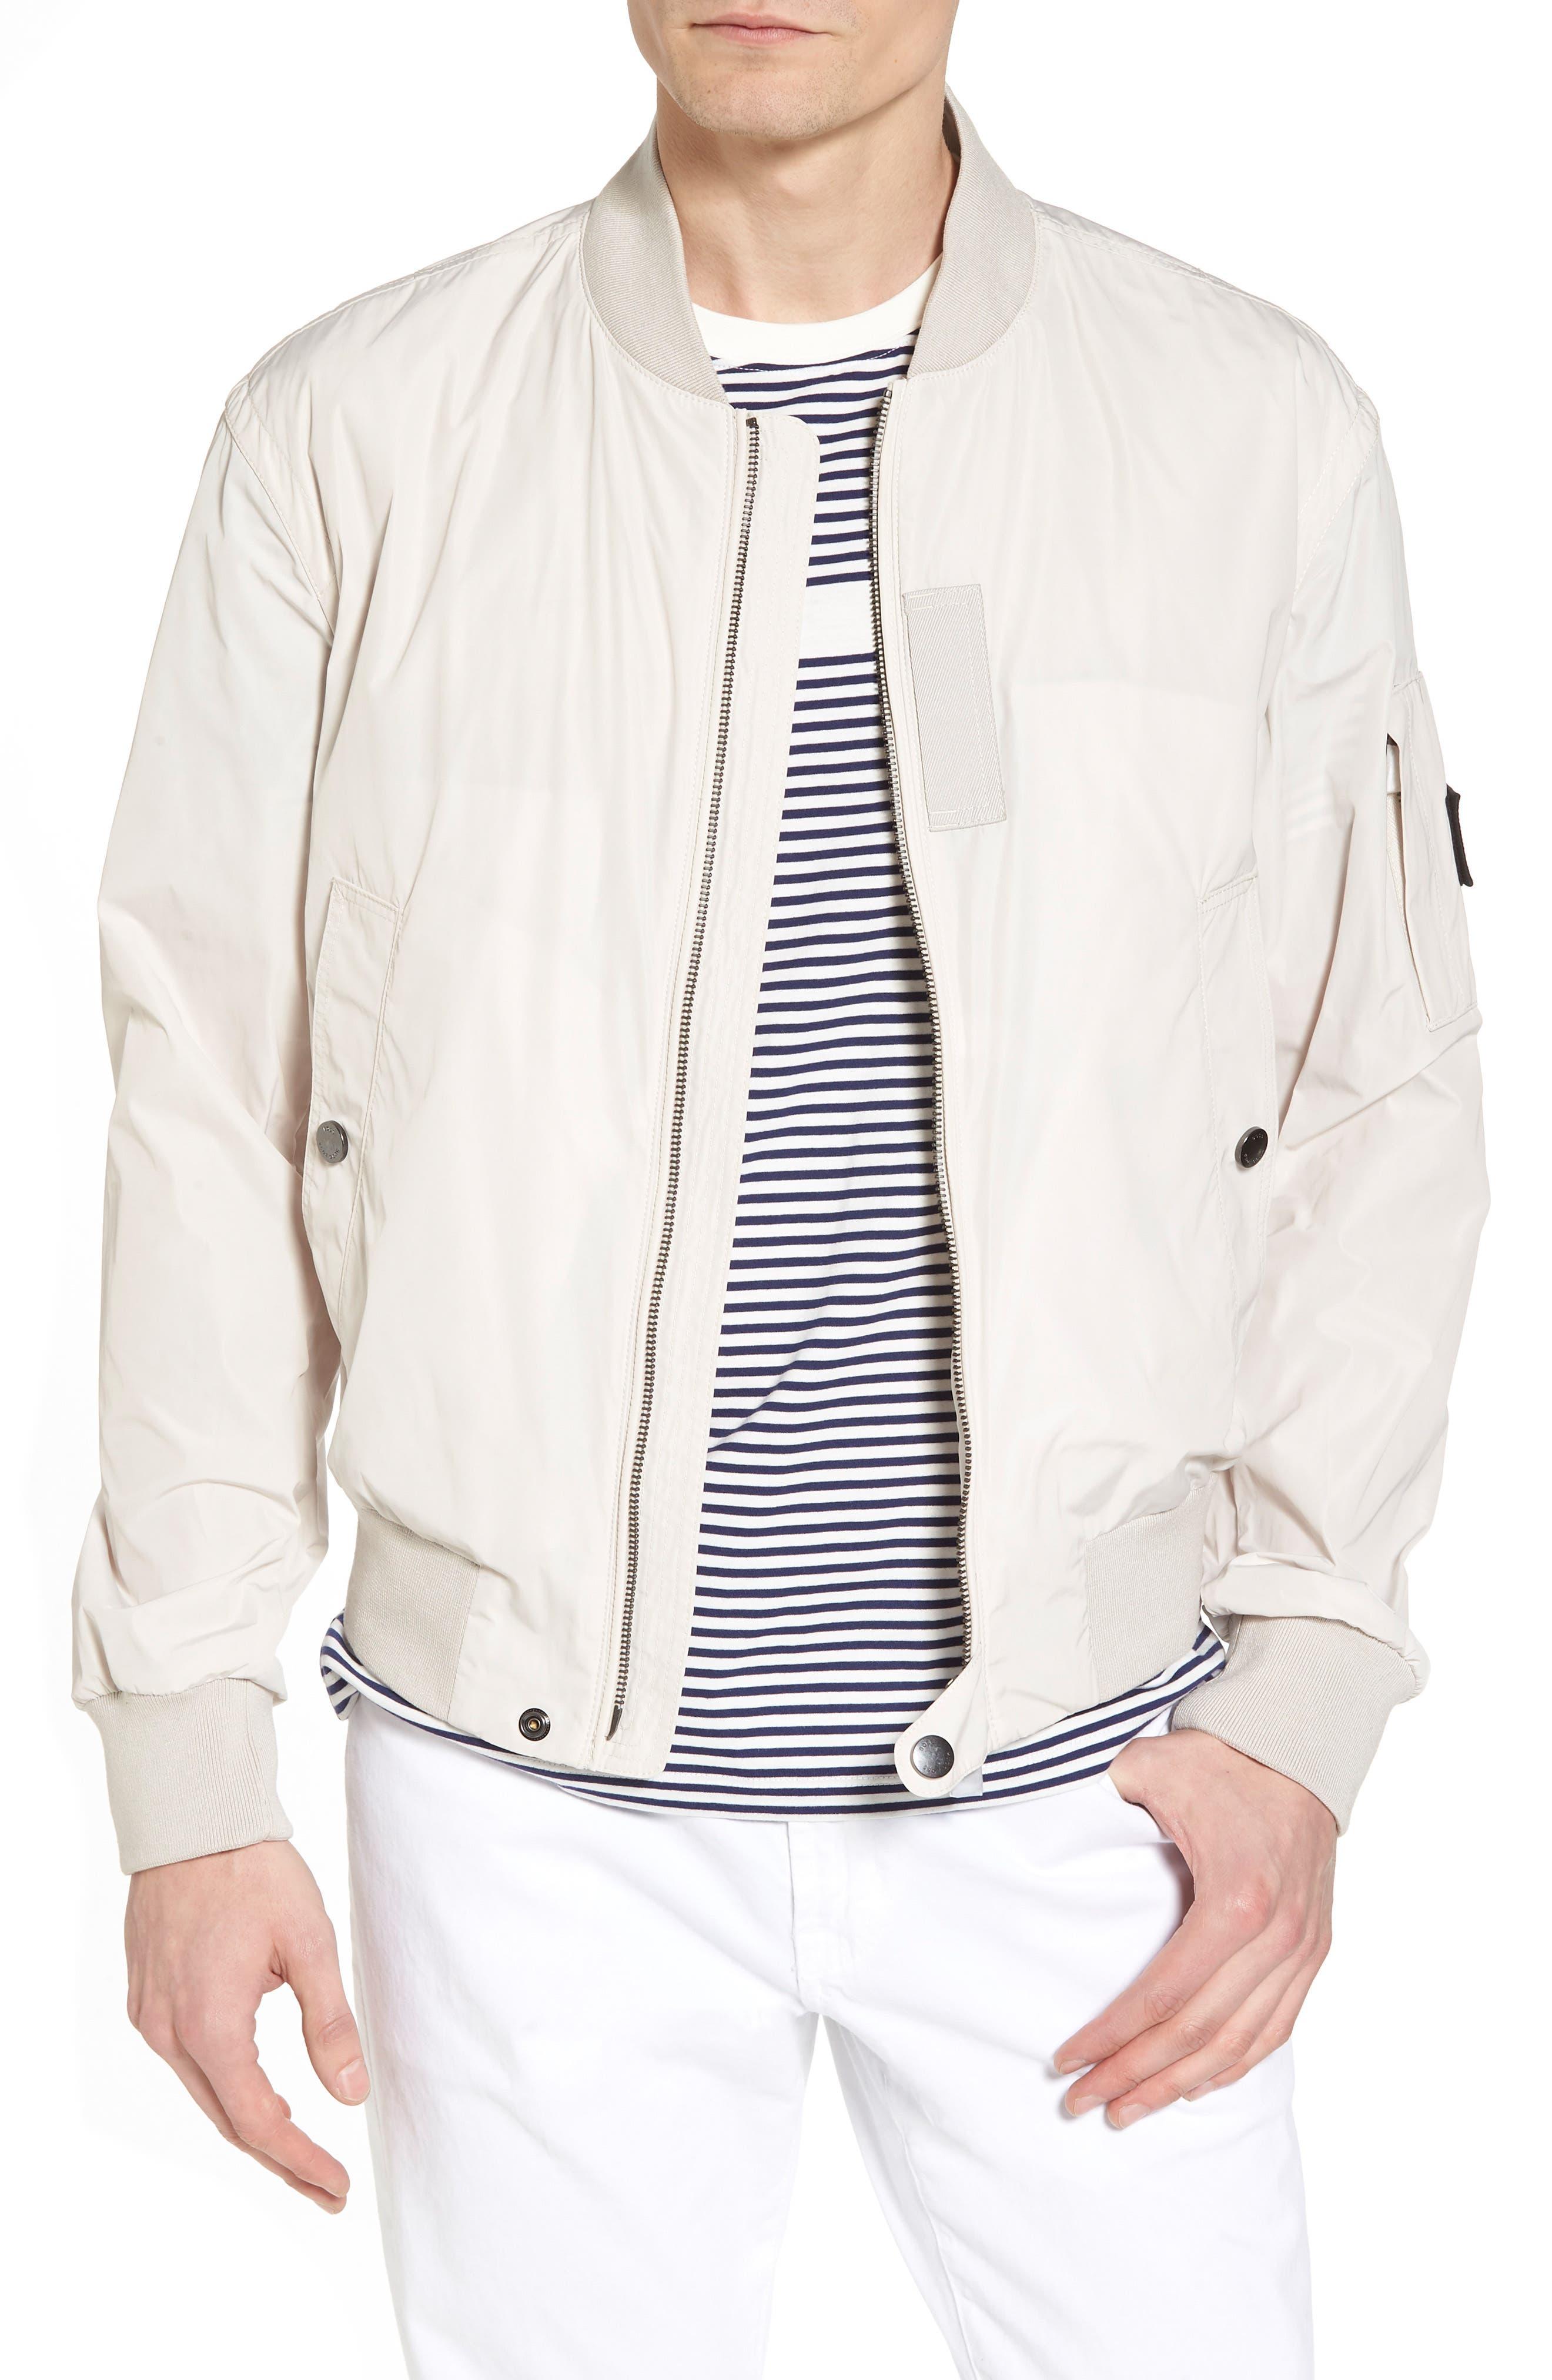 Regular Fit Bomber Jacket,                             Main thumbnail 1, color,                             White